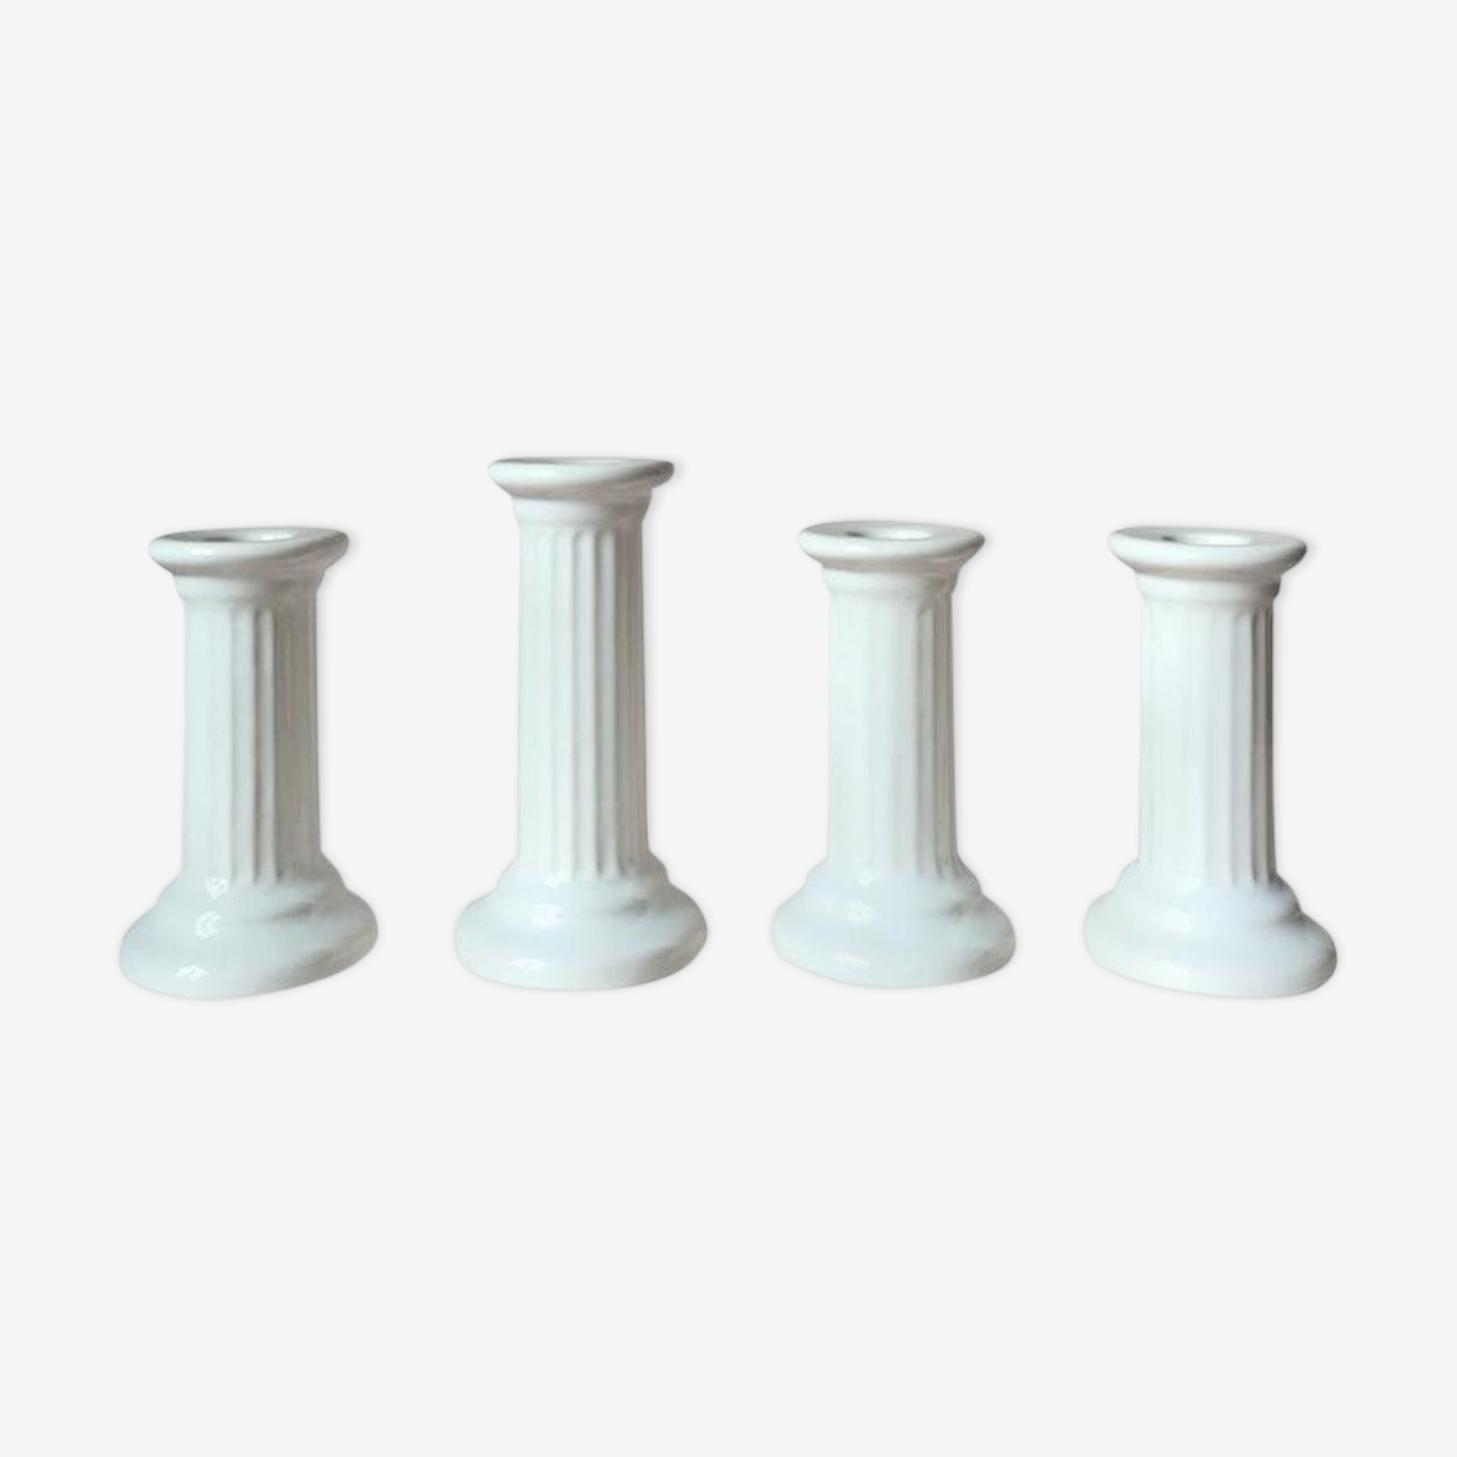 4 Vintage Swedish Ceramic Column White Candle Holders from Guldkroken